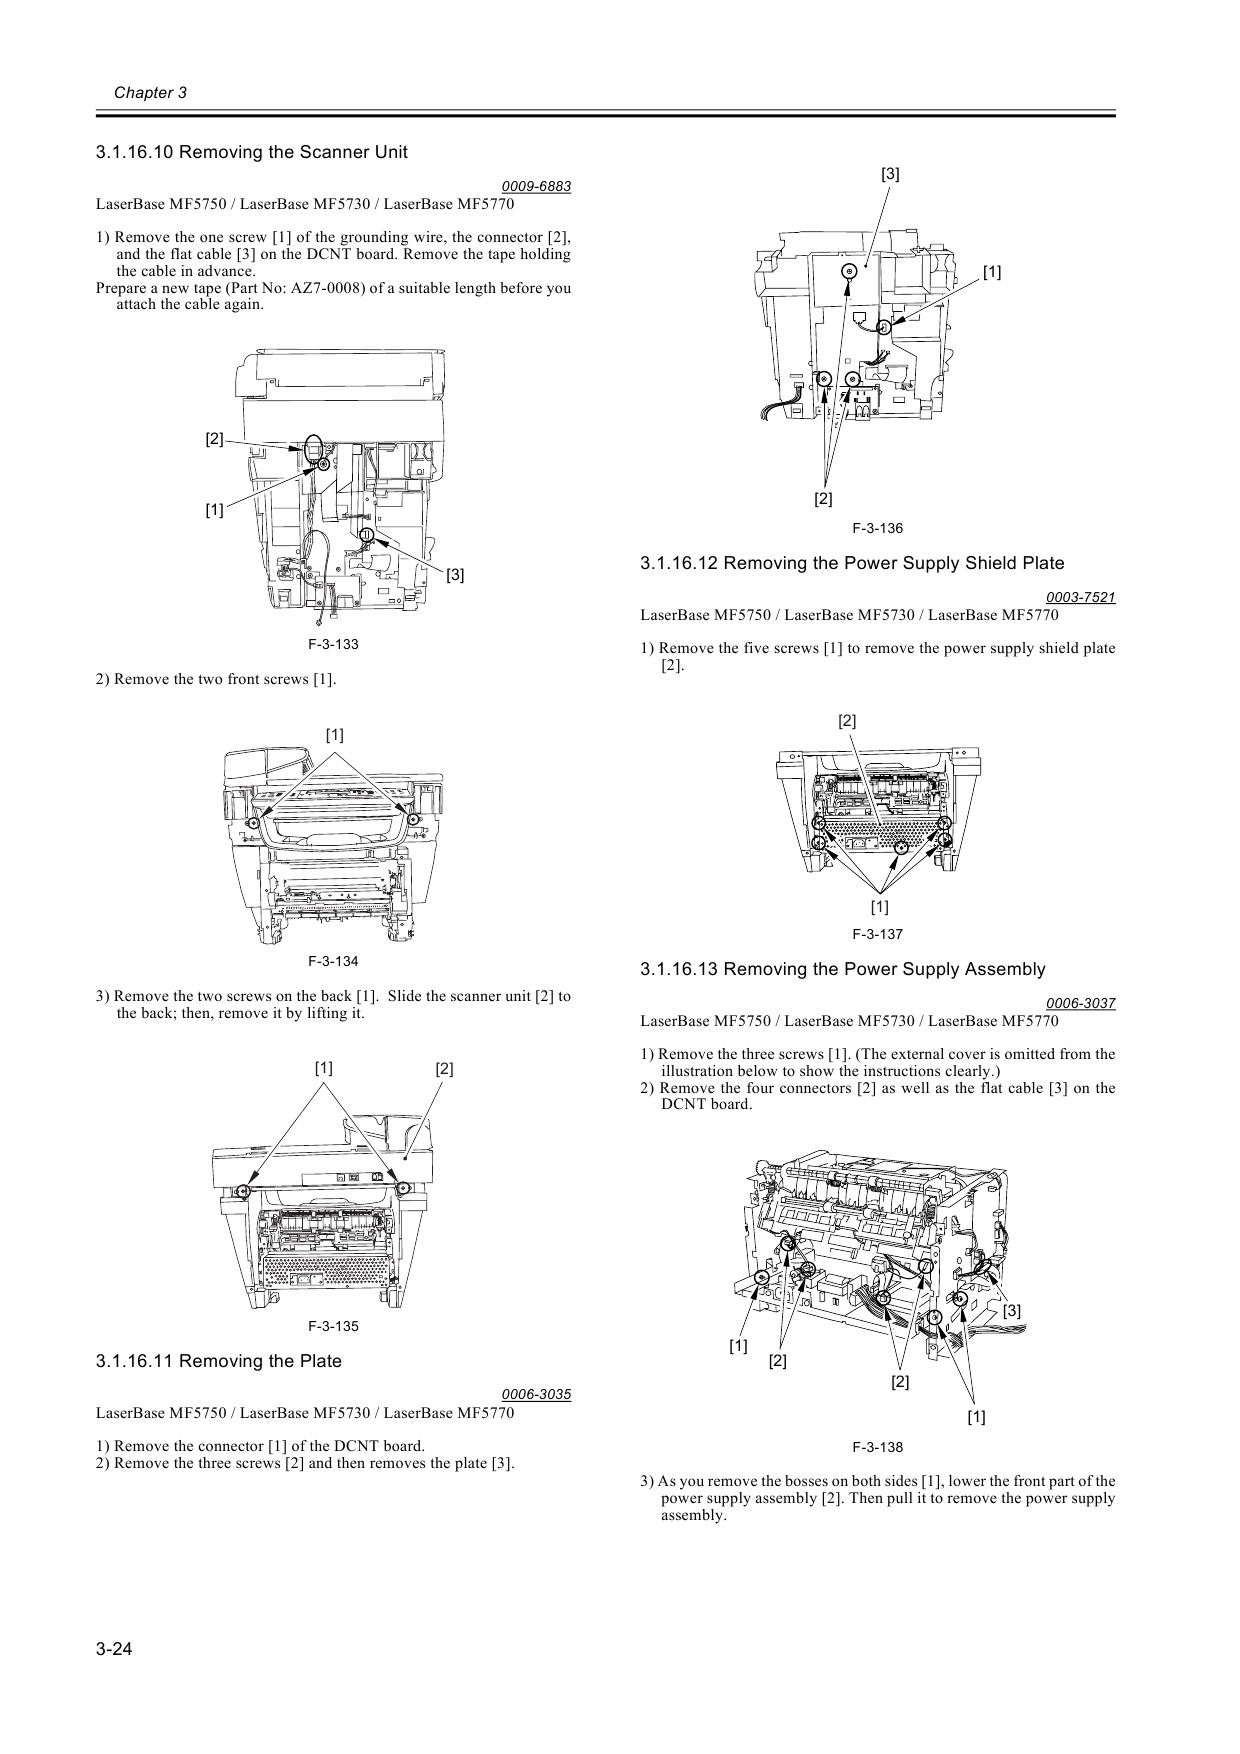 canon imageclass d320 service manual